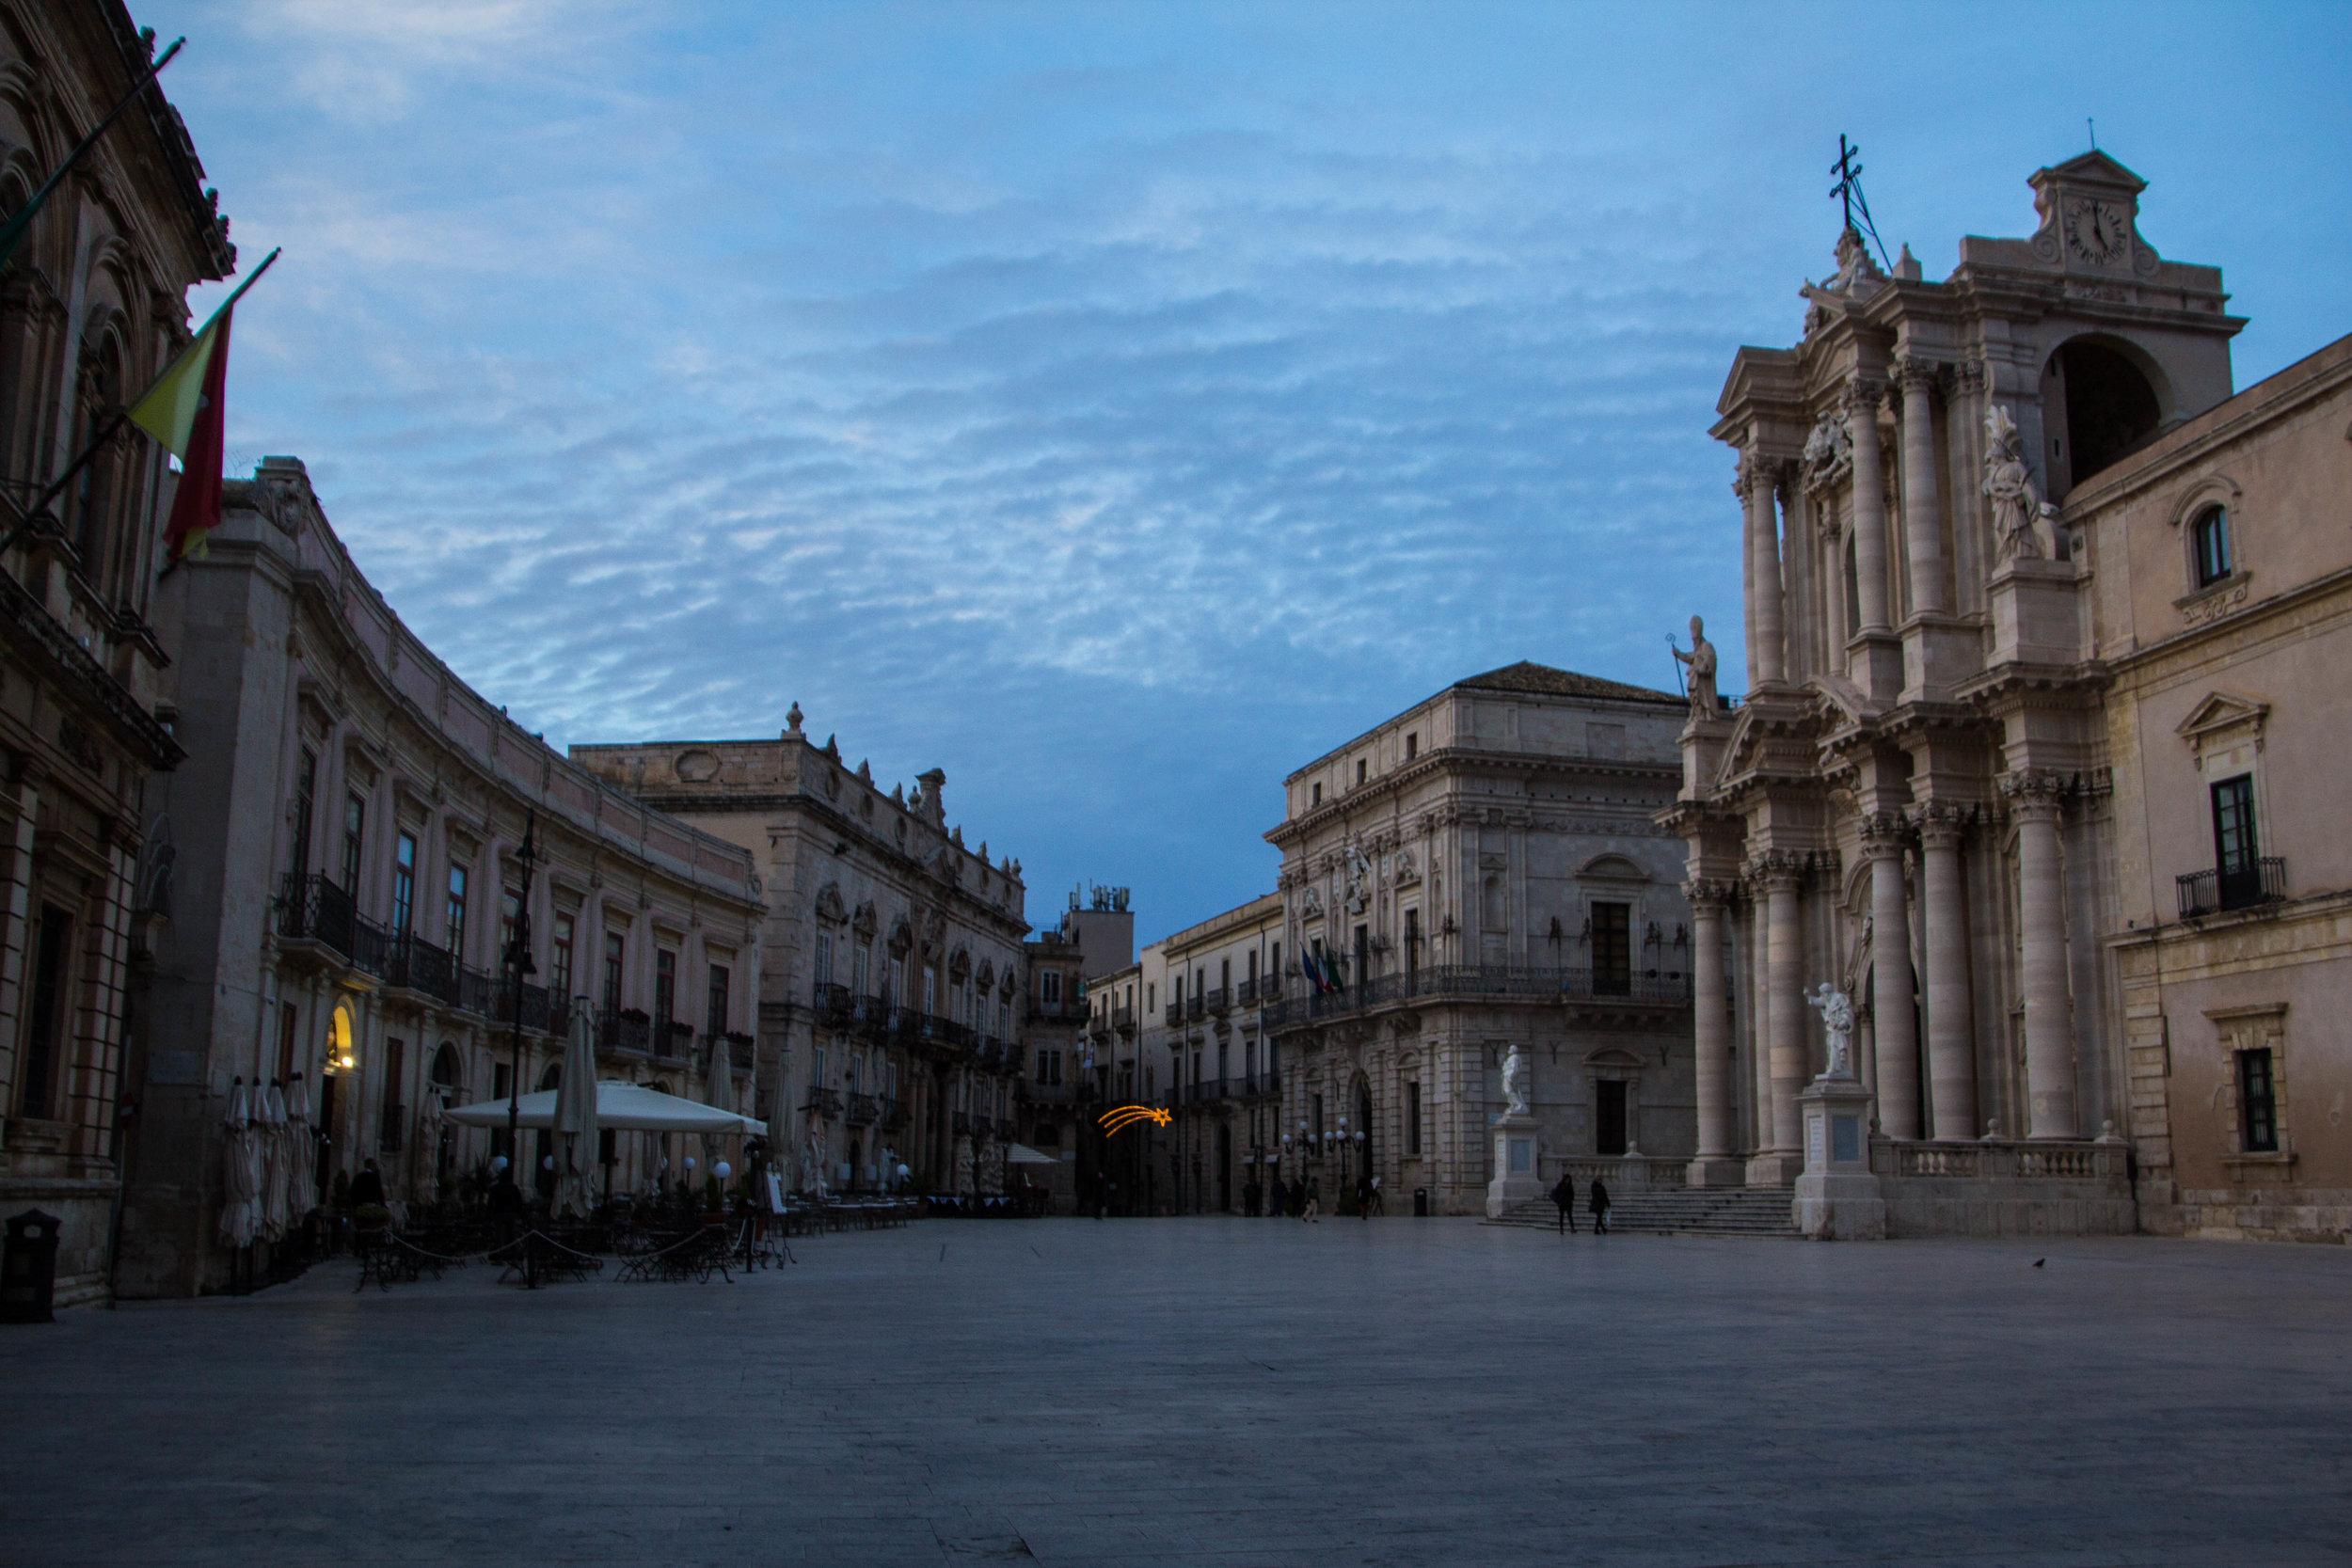 piazza-duomo-sunset-ortygia-syracuse-sicily-7.jpg